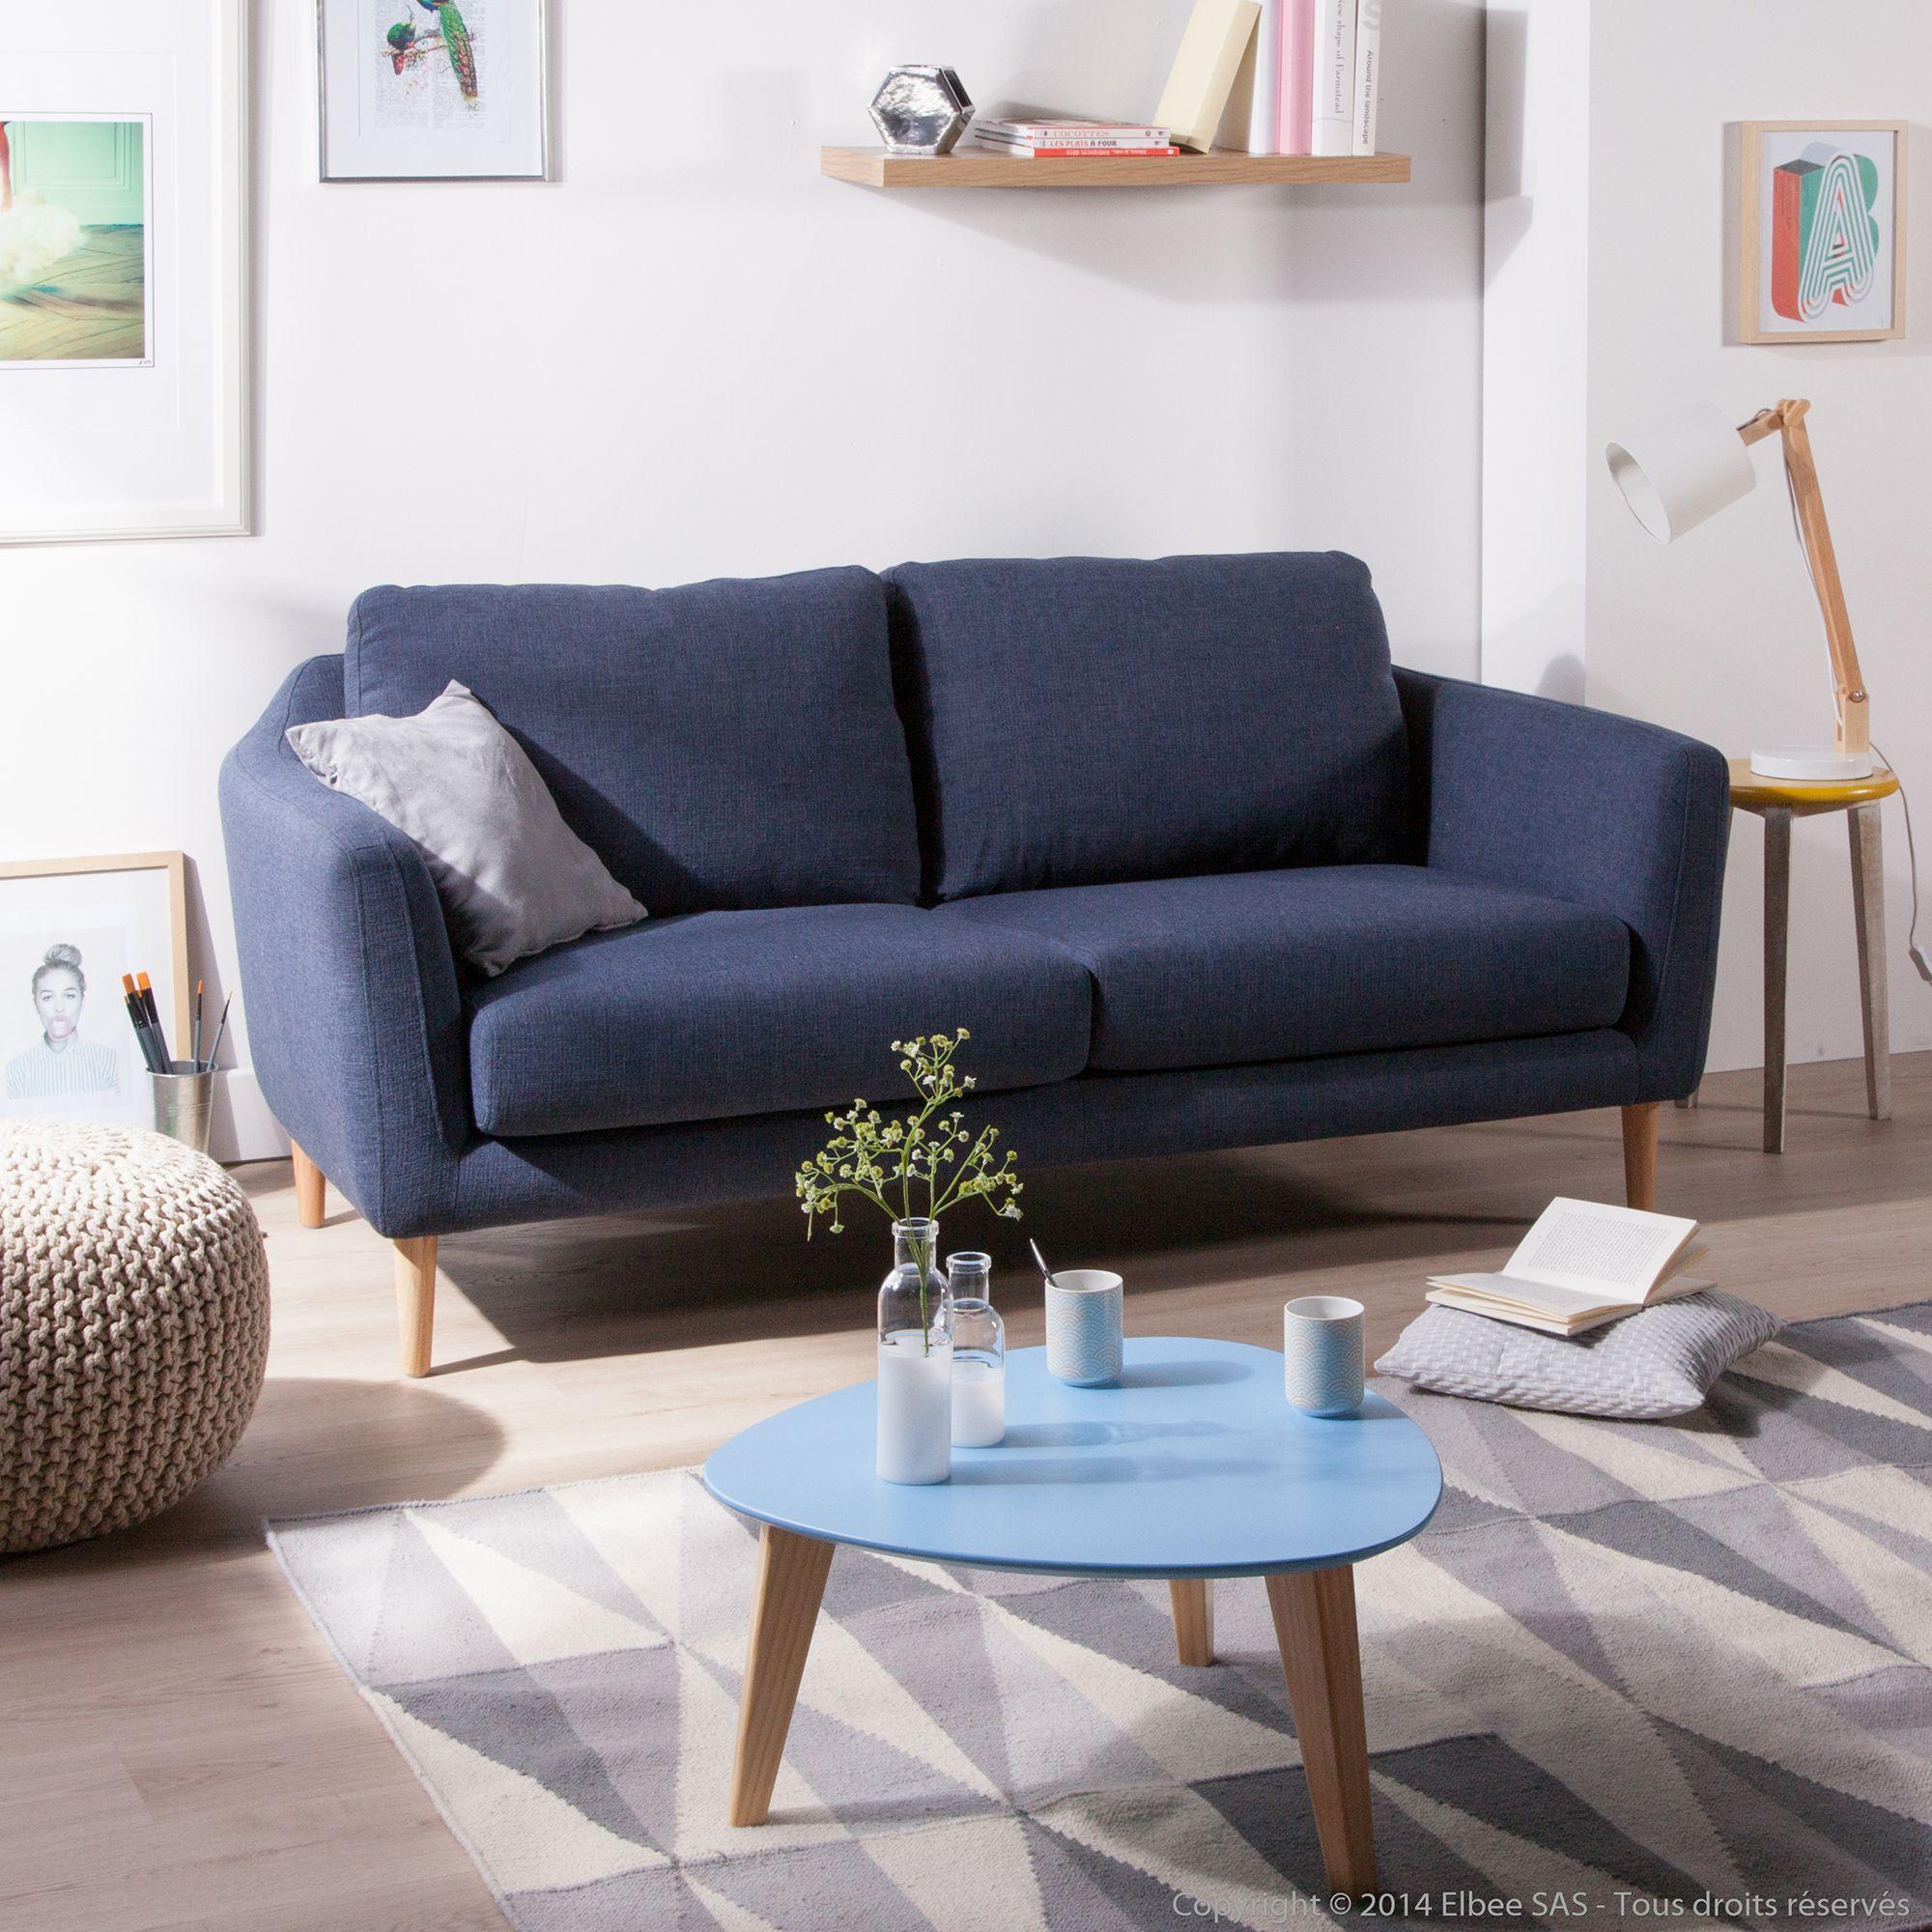 Canap Fixe Tissu Pieds Bois Style Scandinave Hej Kaligrafik  # Canape D'Angle Style Scandinave Bleu